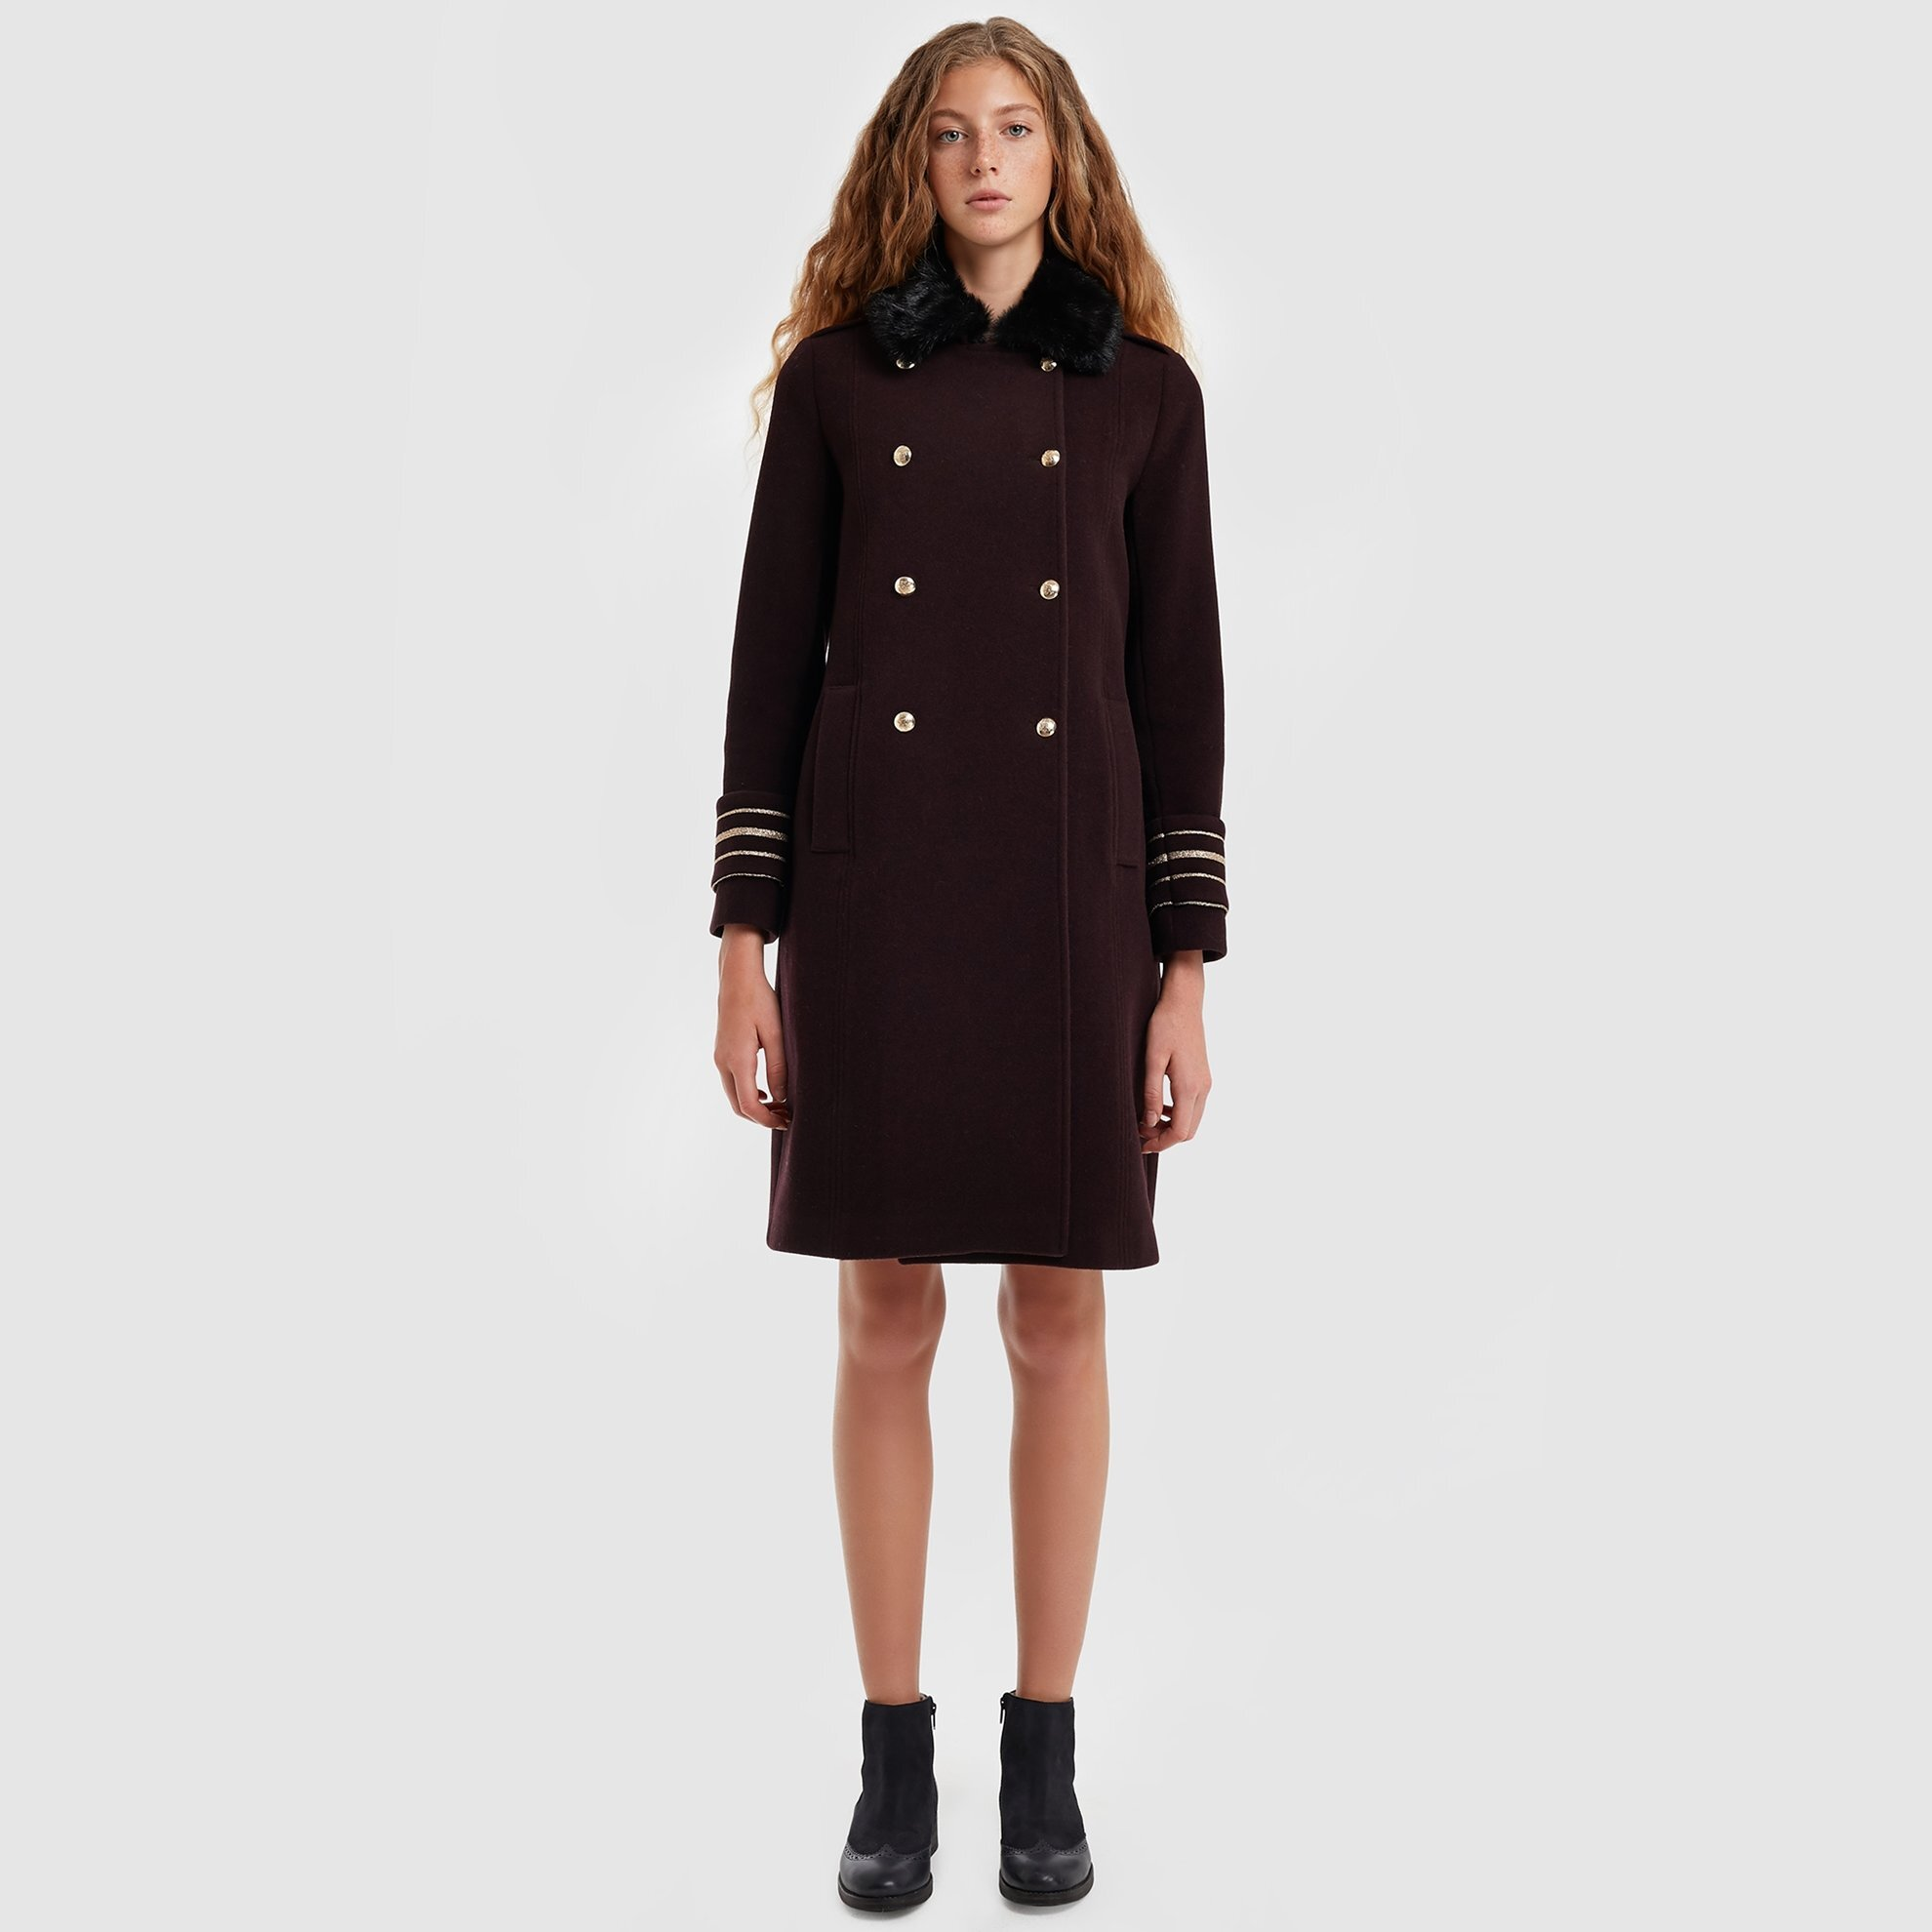 resm Yırtmaç Detaylı Palto